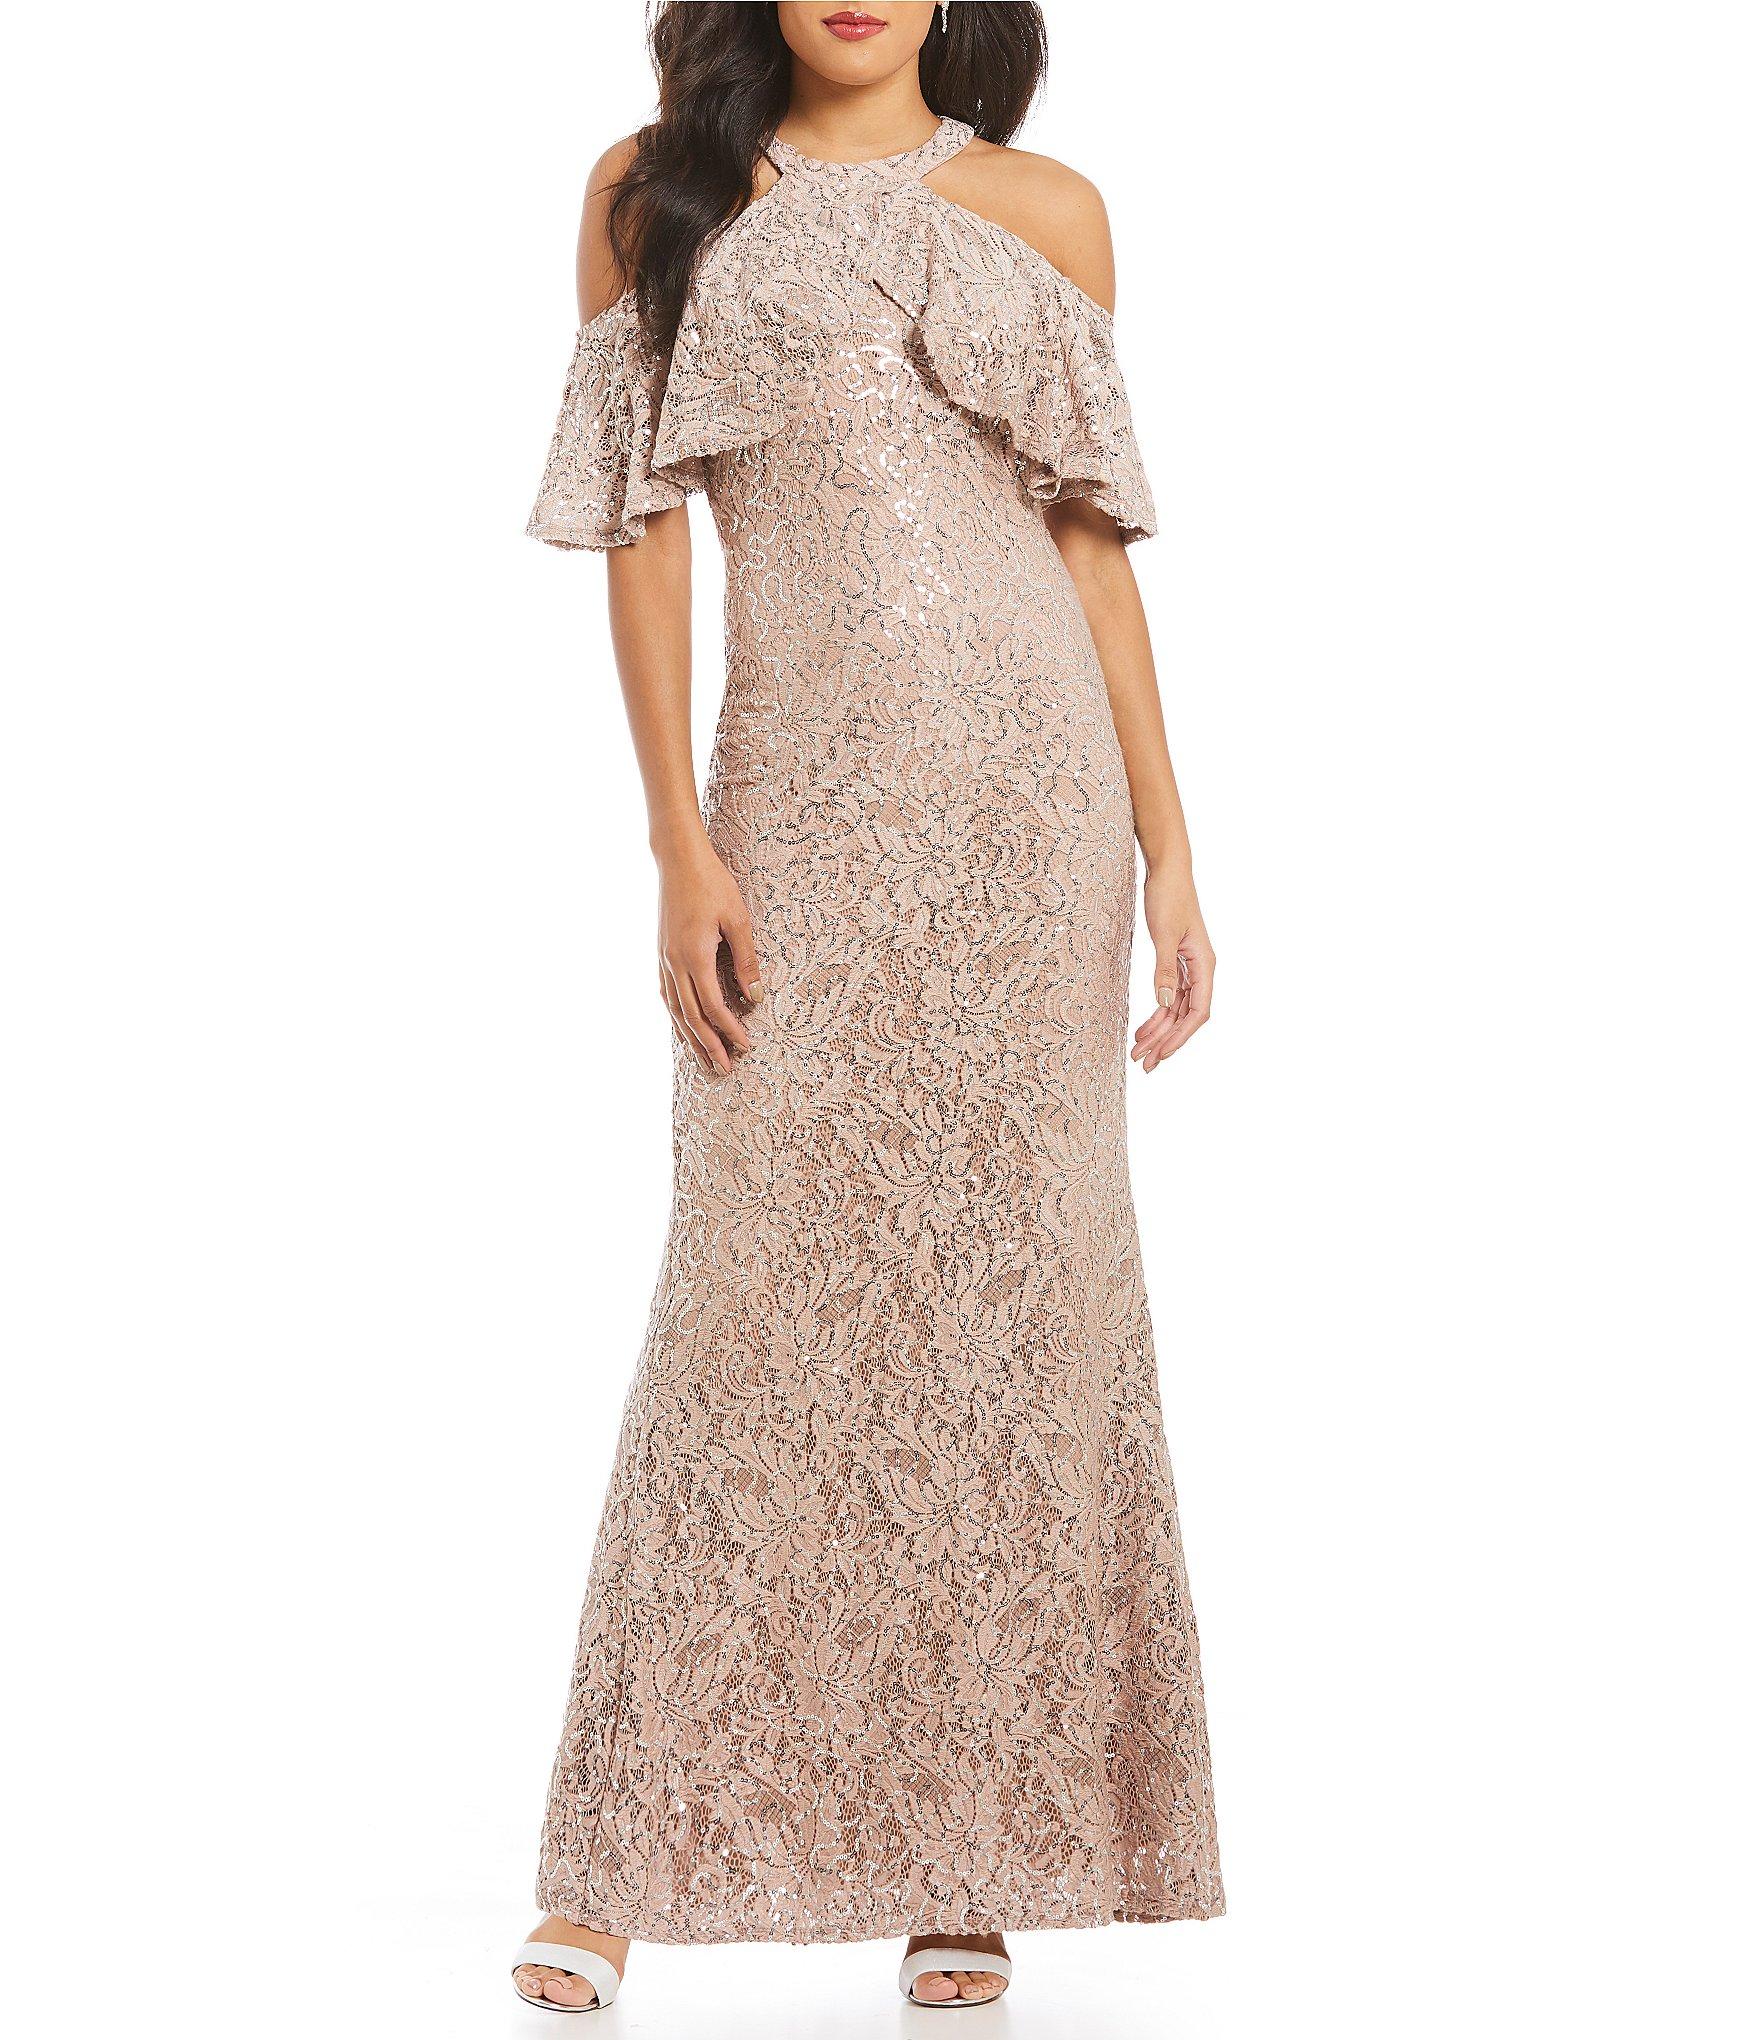 Champagne Lace Dress Leslie Faye